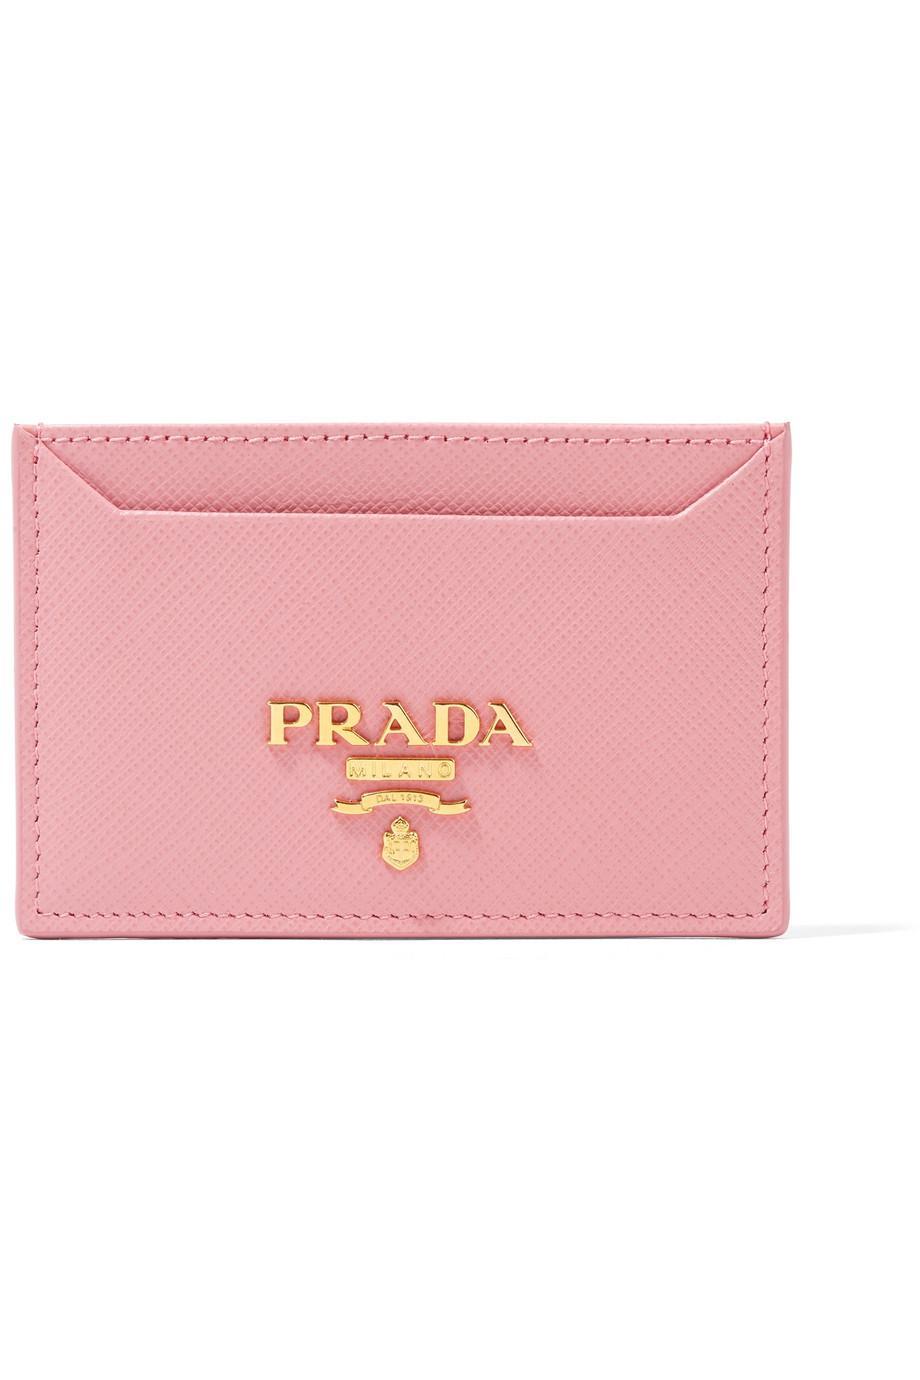 Textured-leather Cardholder - Pink Prada nUZjyzsbY